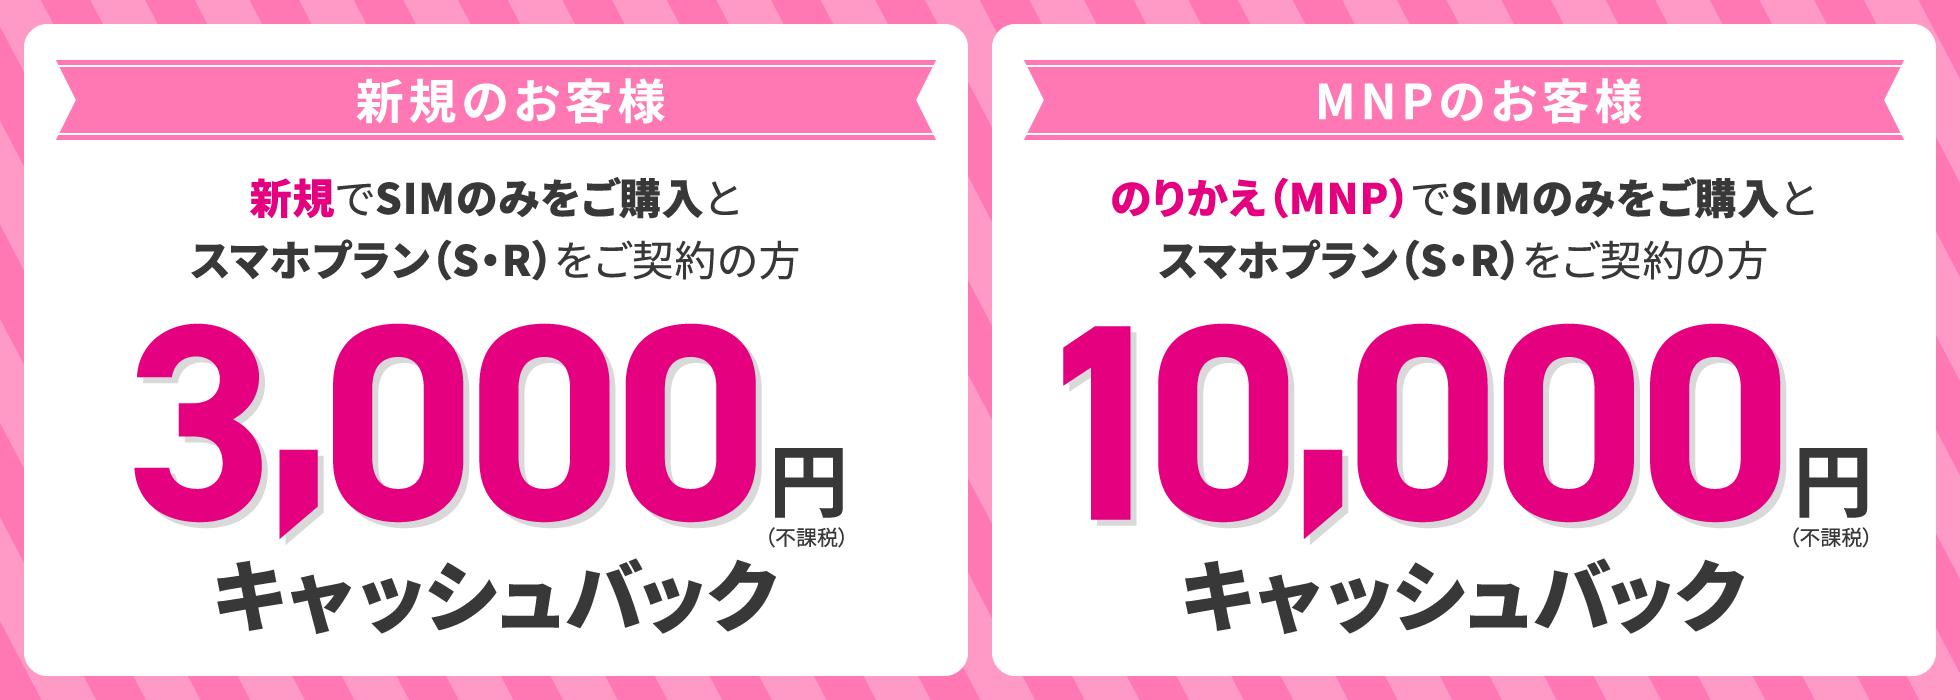 UQモバイルのキャッシュバックはMNP契約で10,000円、新規契約で3,000円となります。